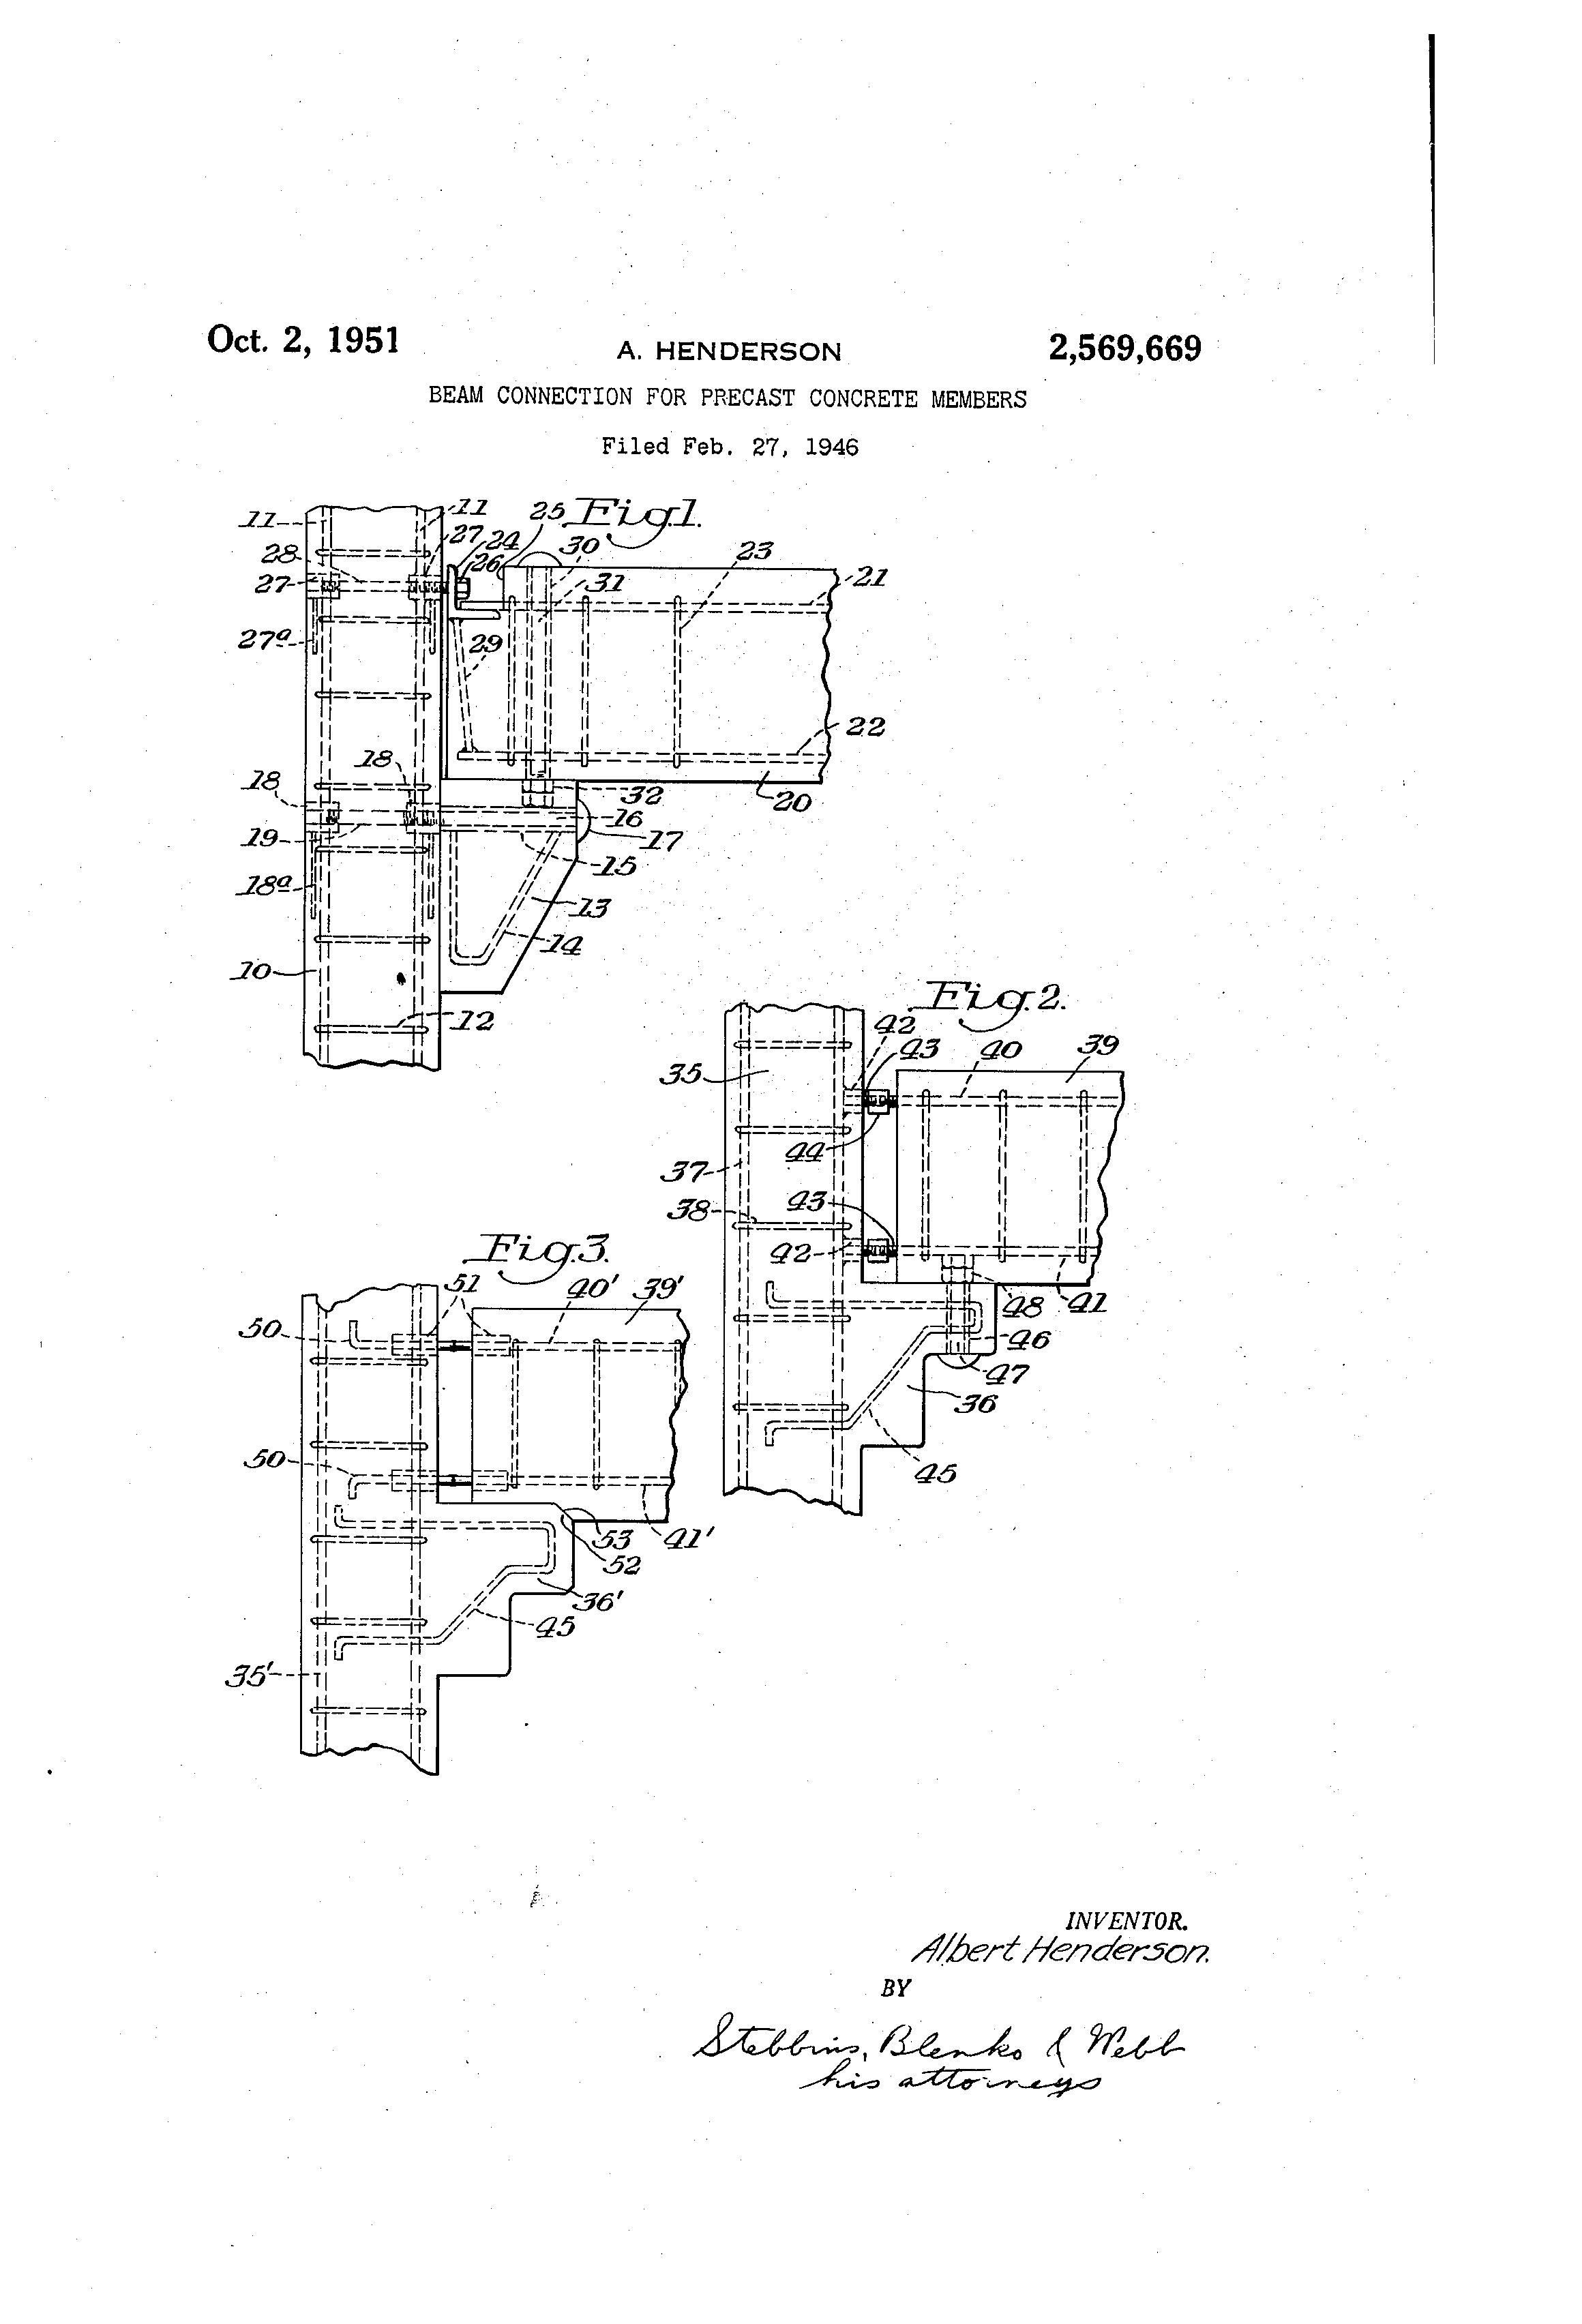 Precast Concrete Brackets : Patent us beam connection for precast concrete